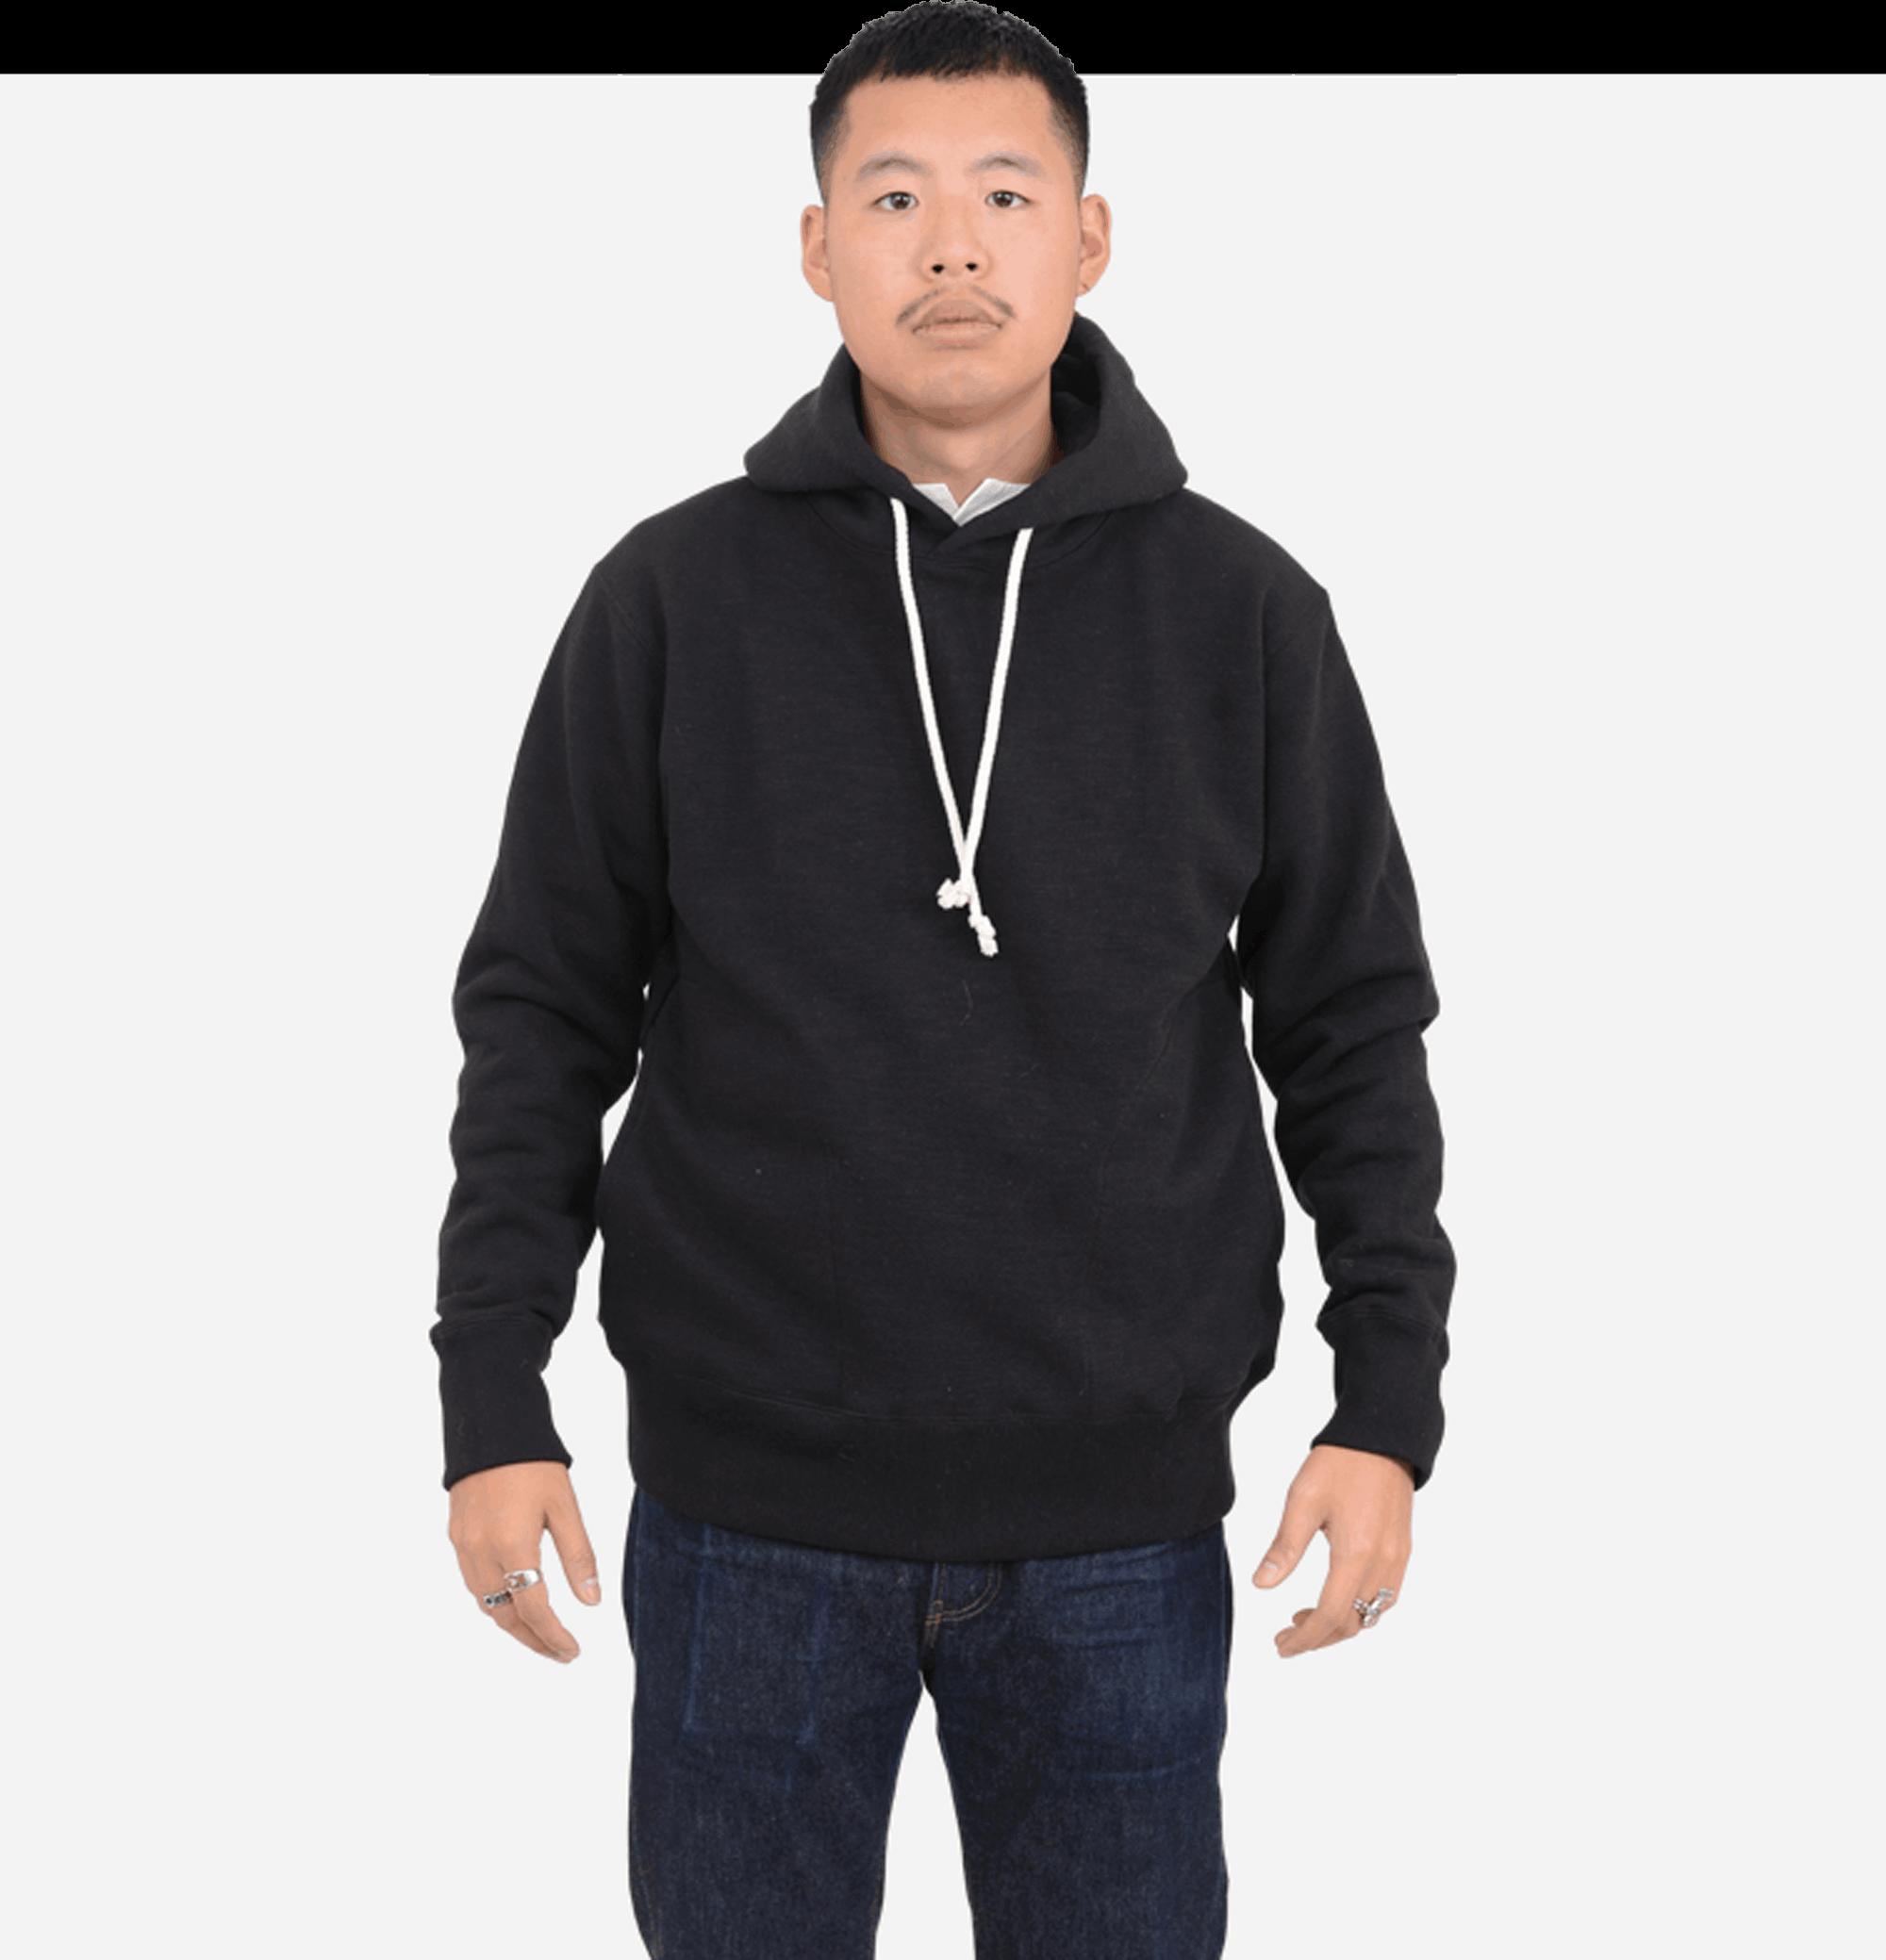 Pullover Sweatshirt Black